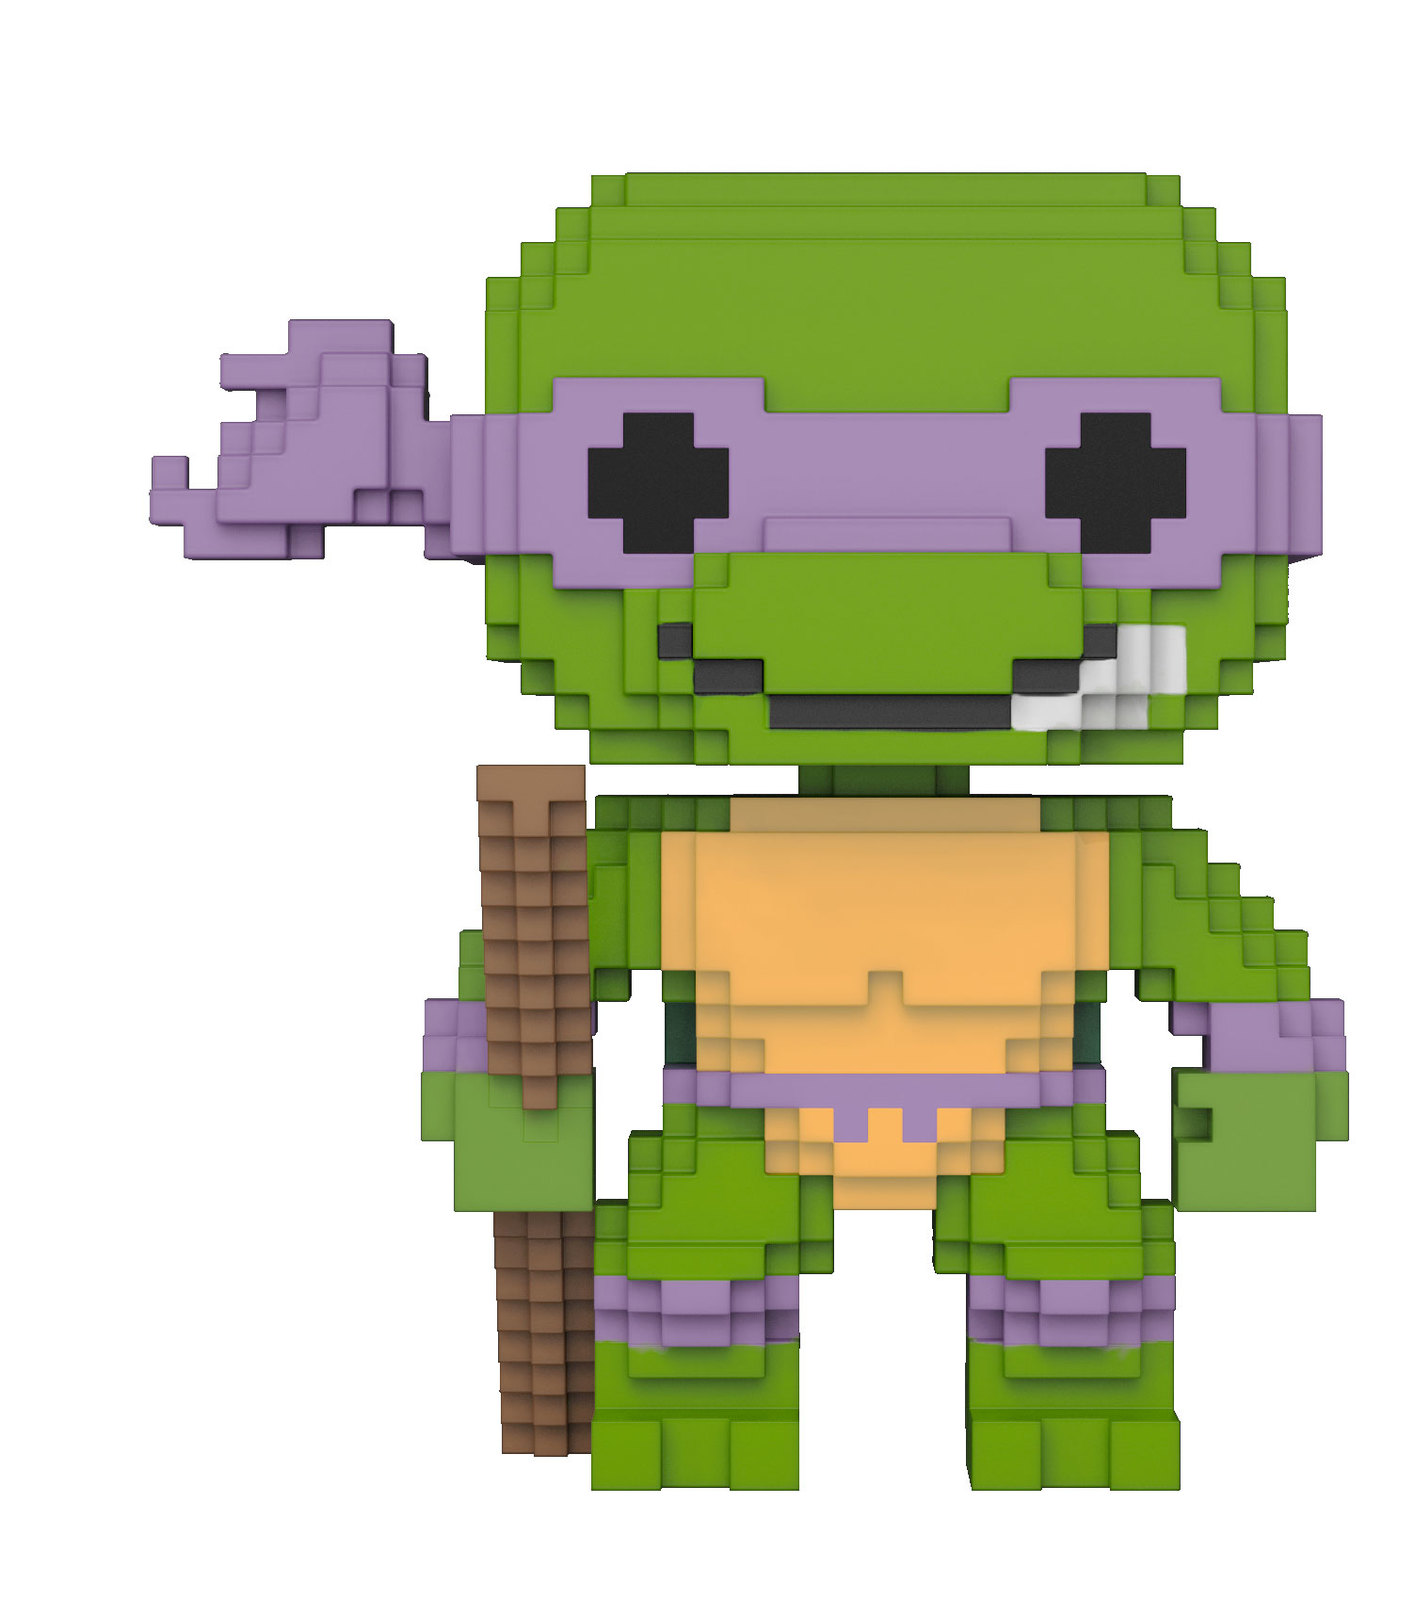 TMNT - Donatello (8-Bit) Pop! Vinyl Figure image